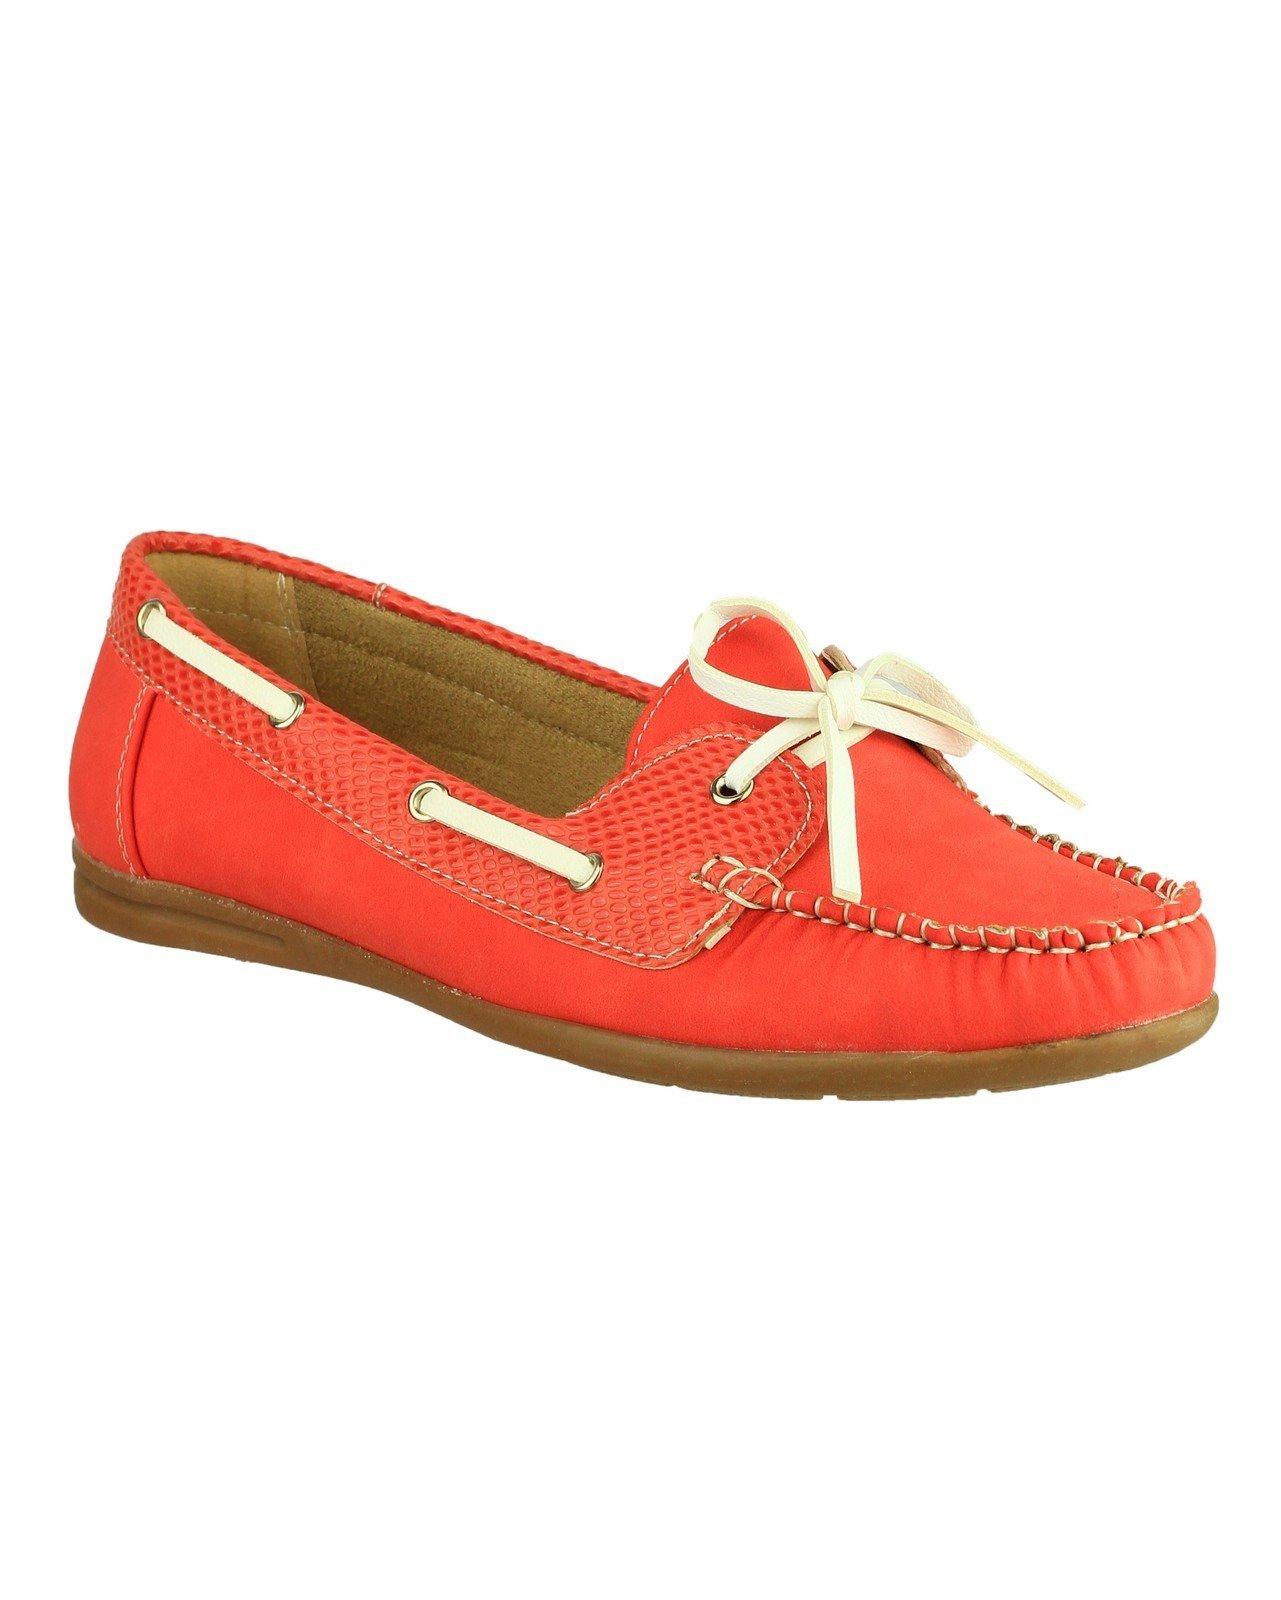 Divaz Women's Belgravia Slip on Shoe Red 19838-31017 - Red 5